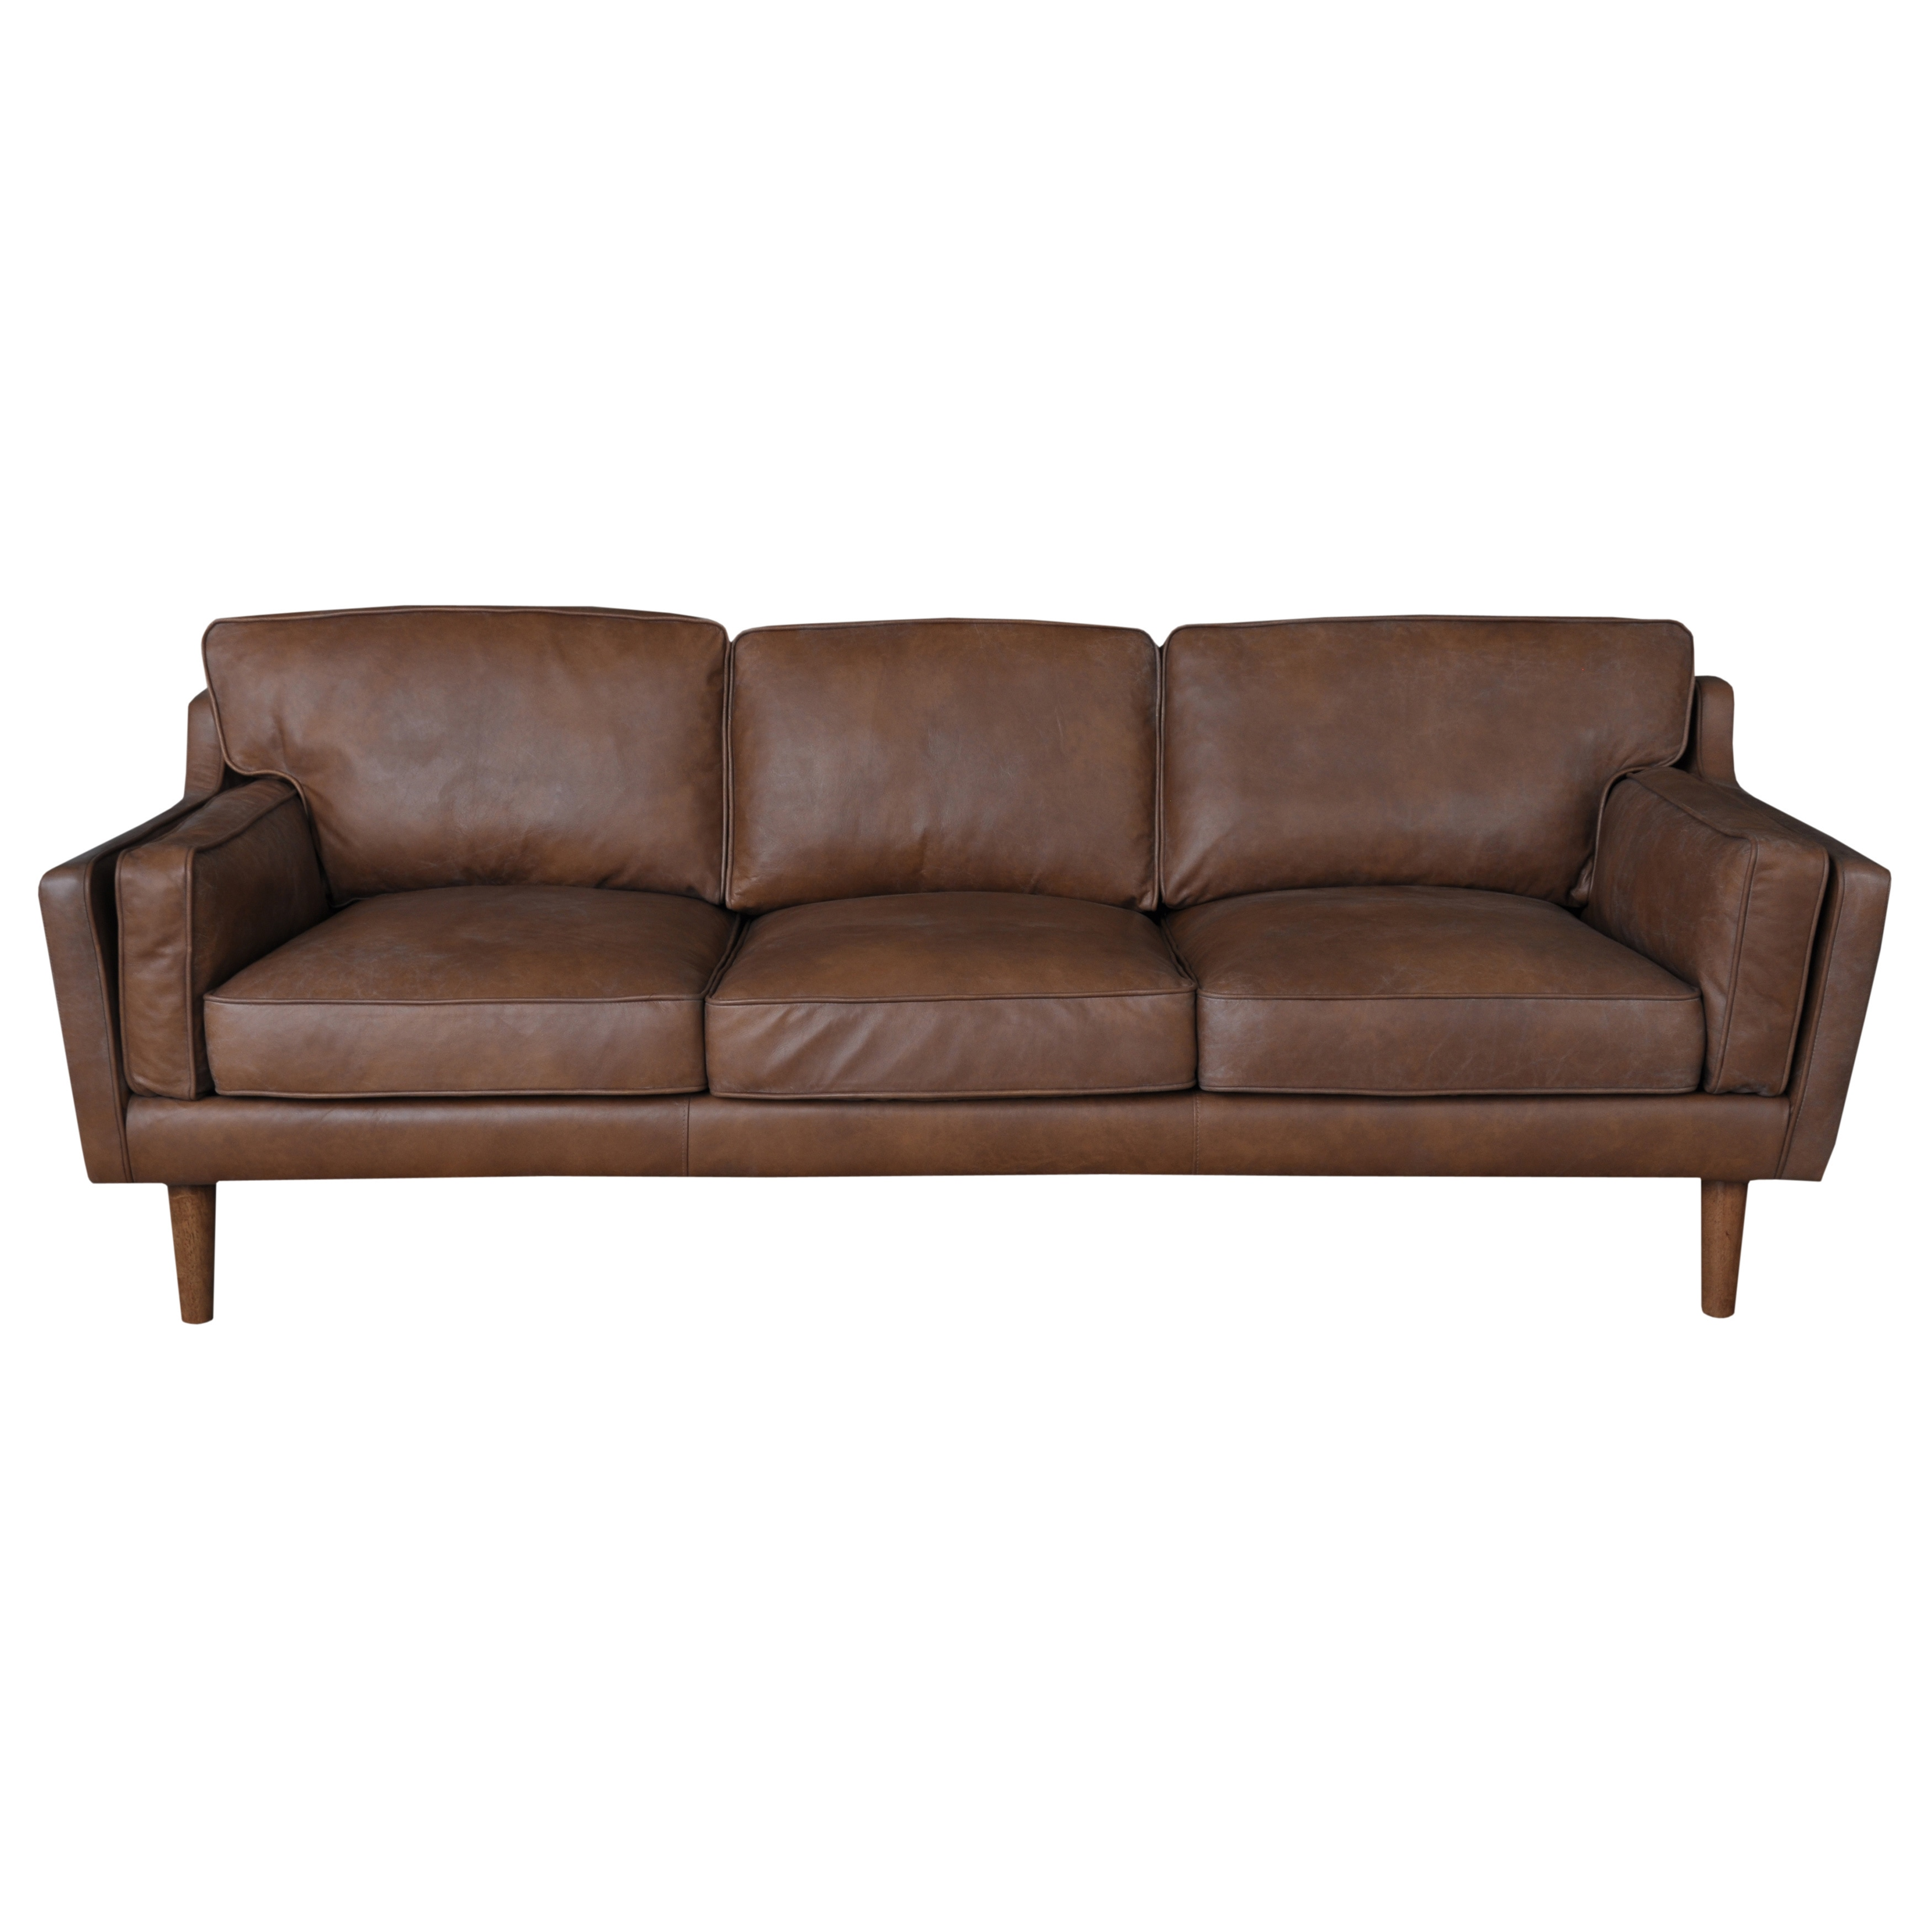 Beatnik Oxford Leather Tan Sofa (As Is Item) (Beatnik Oxf...